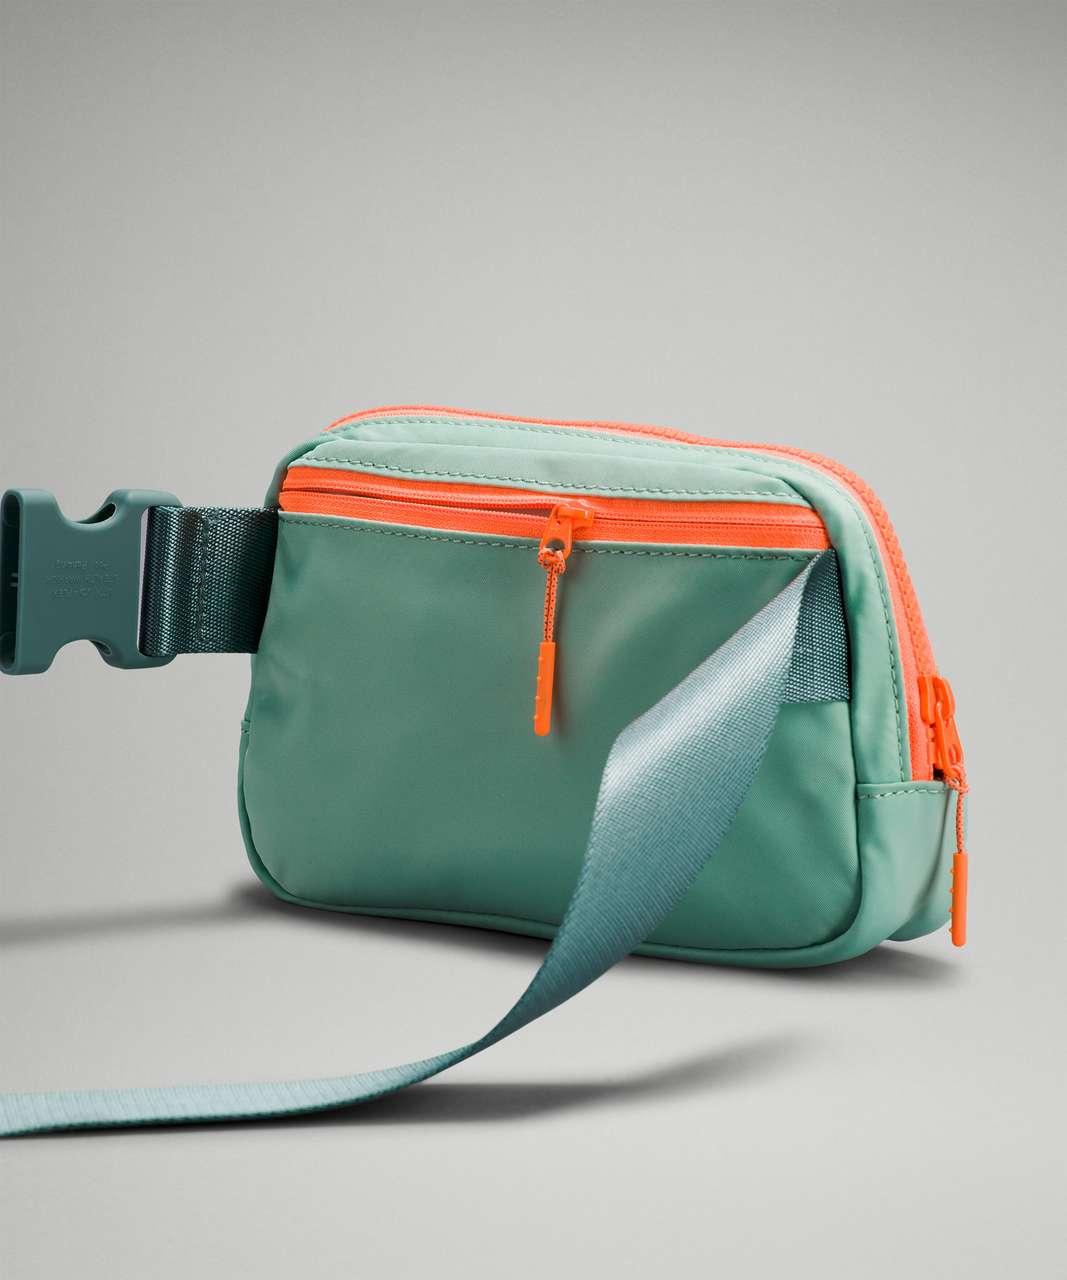 Lululemon Everywhere Belt Bag *1L - Arctic Green / Tidewater Teal